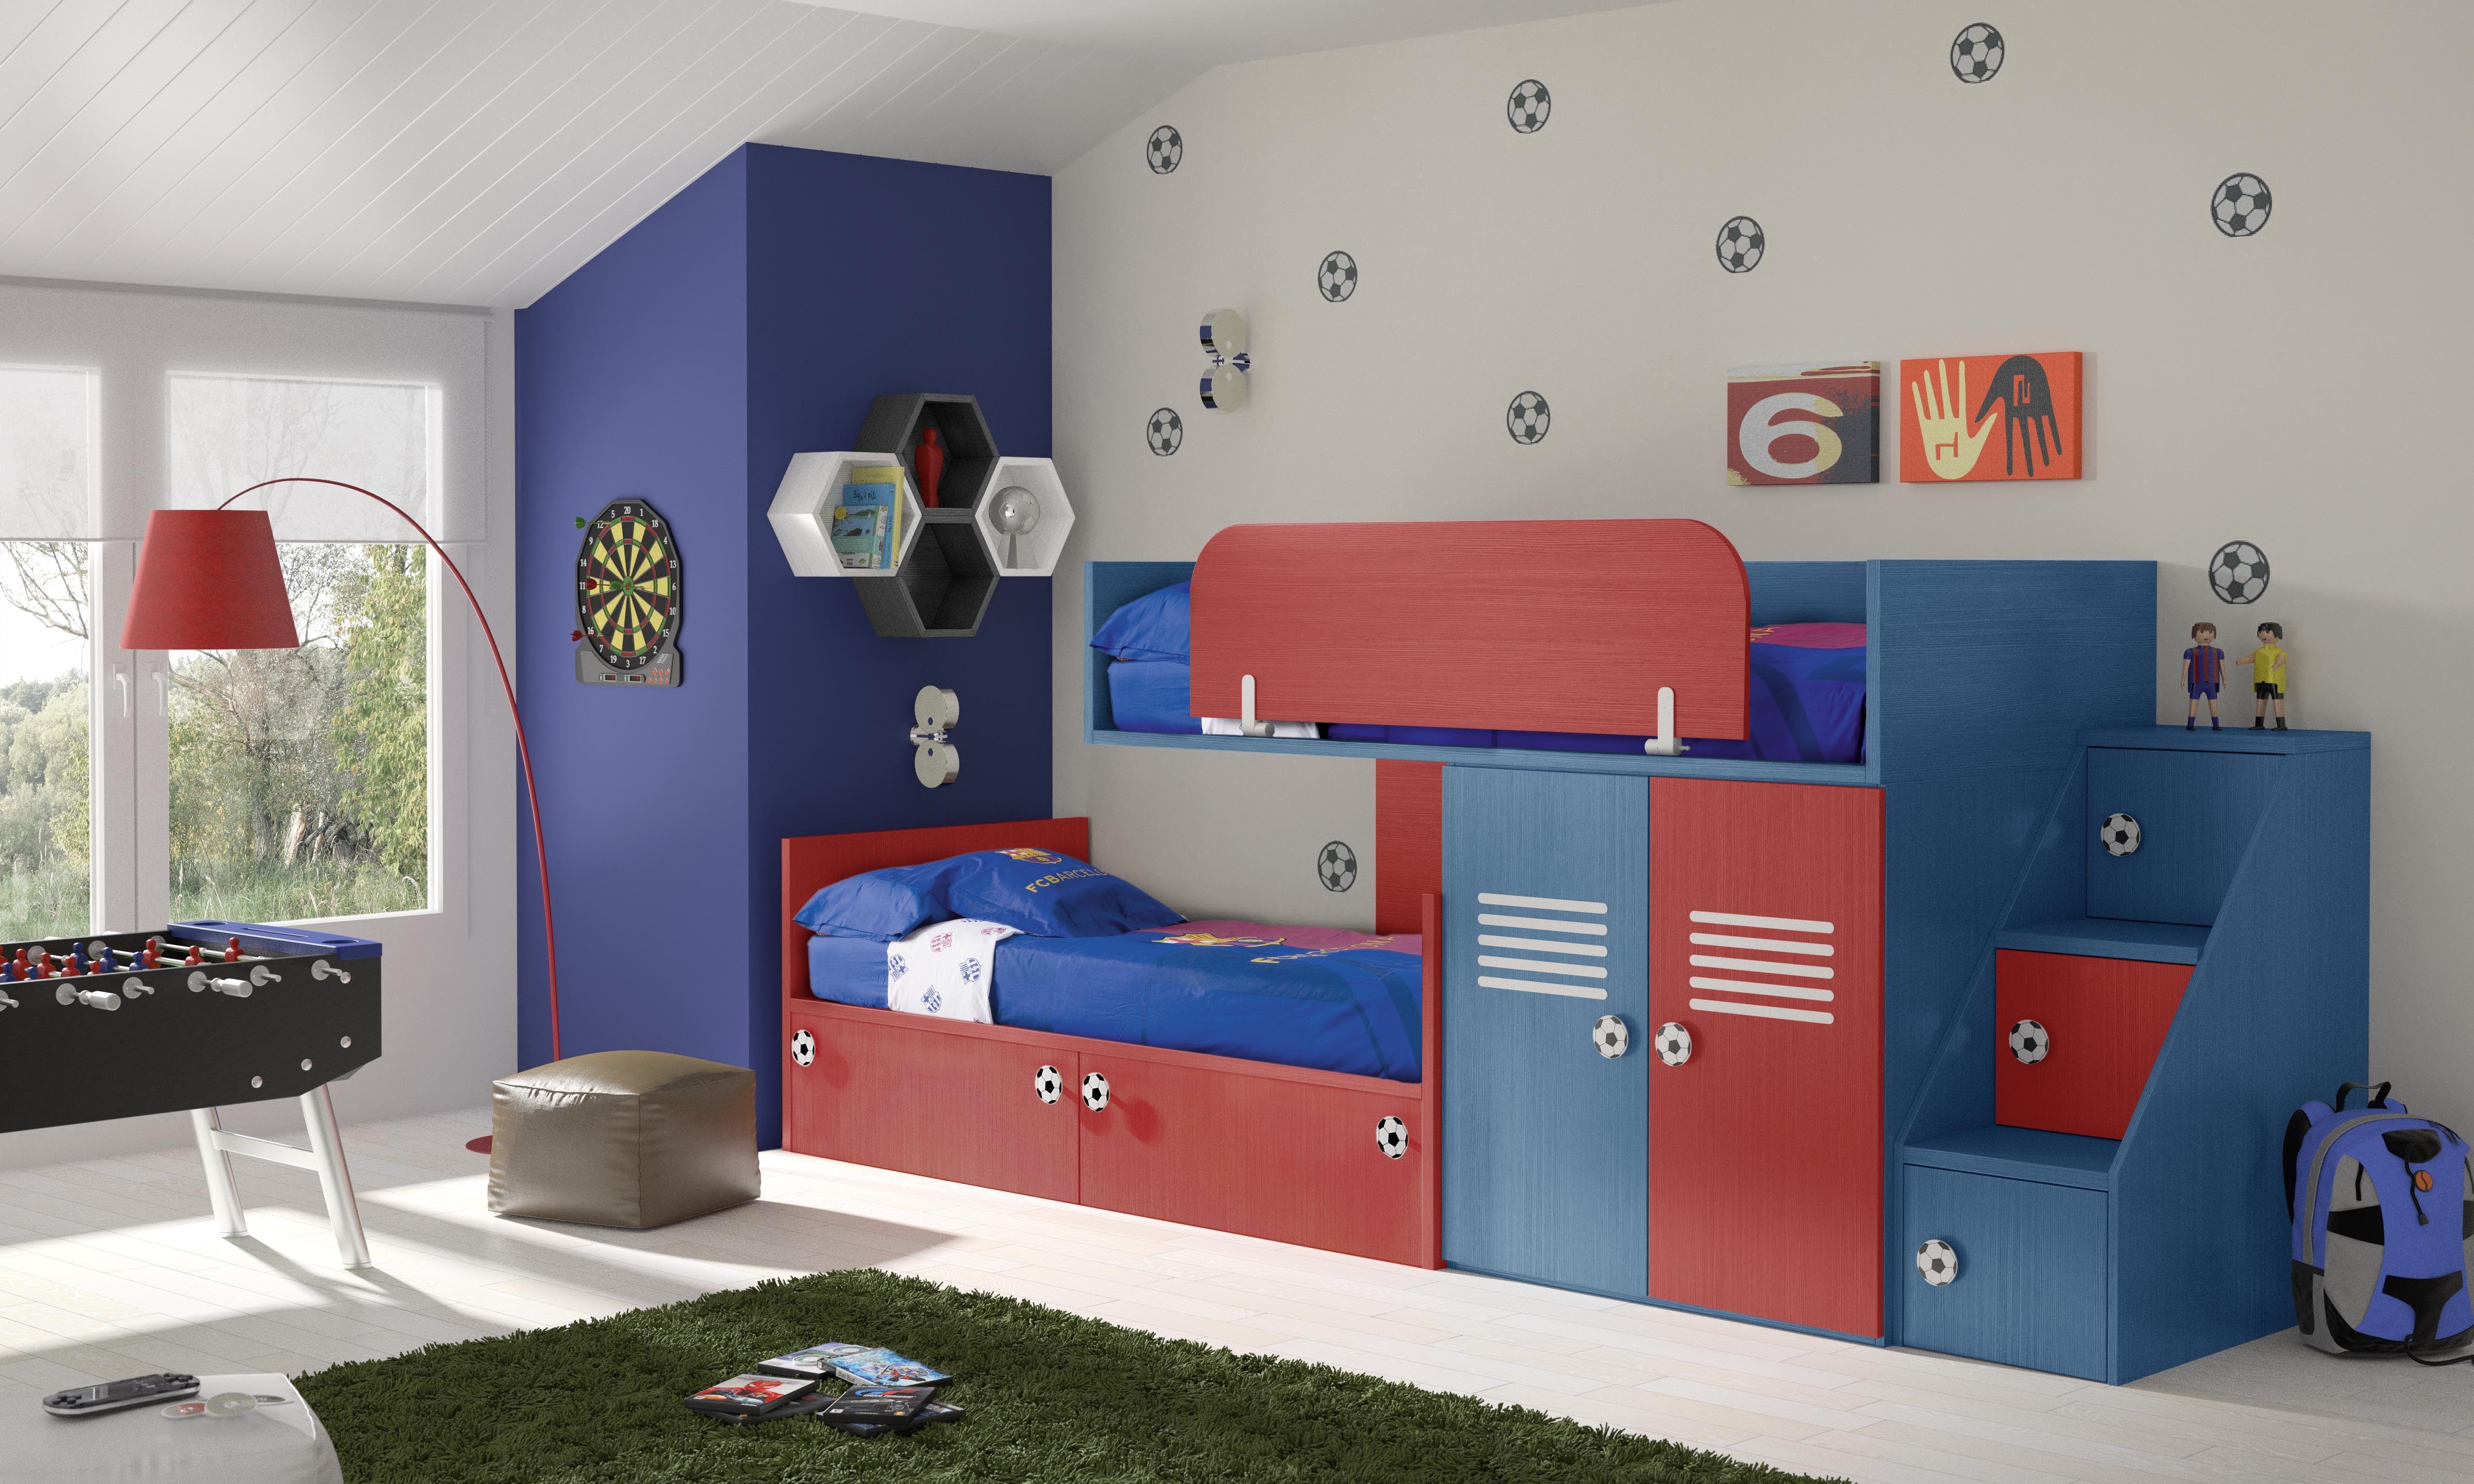 Habitaciones infantiles tem ticas f tbol 1 barcelona - Muebles habitaciones infantiles ...